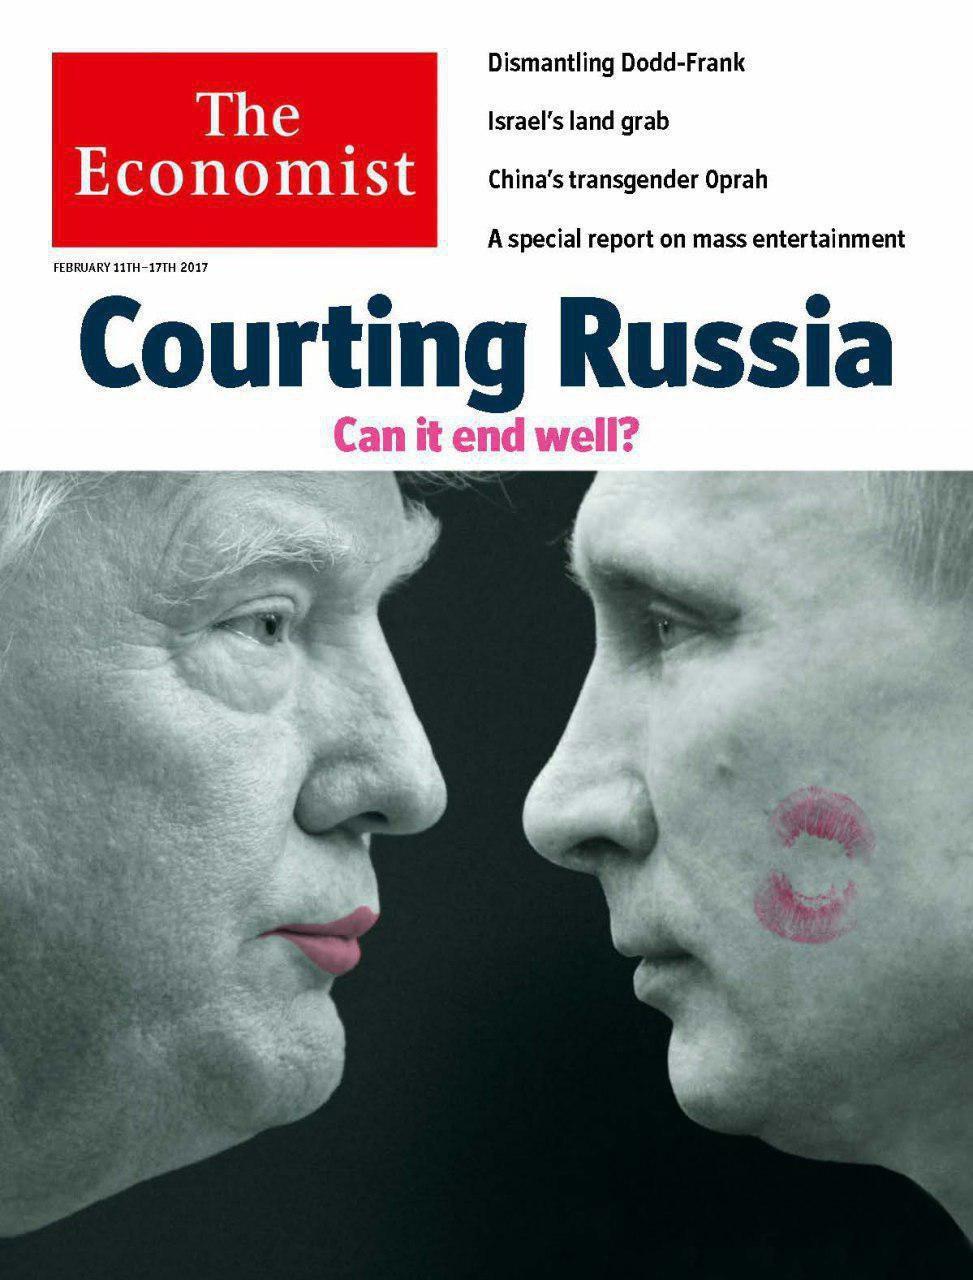 Trump's Kiss on Putin's Cheek in The Economist's Latest Cover